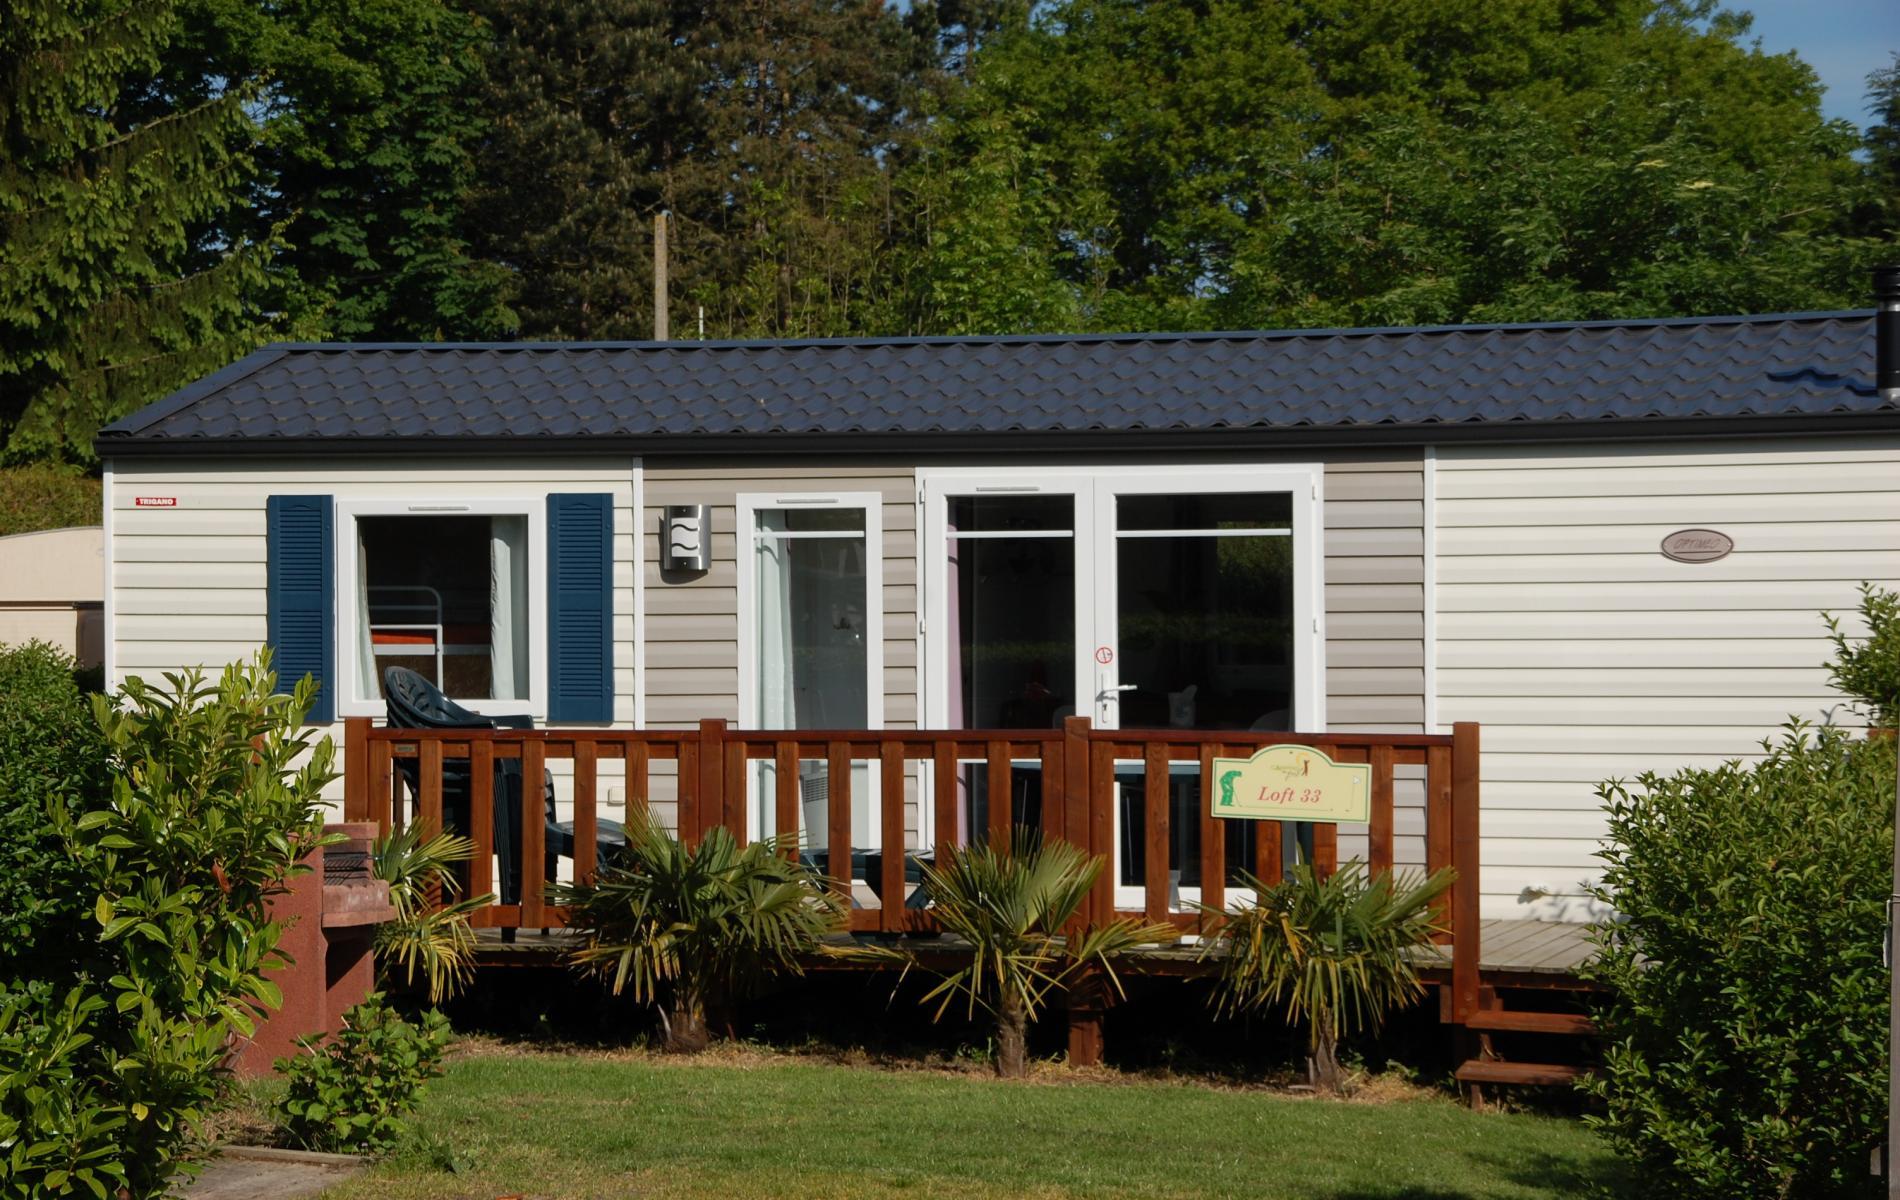 Le camping dispose d'un mobil-home PMR